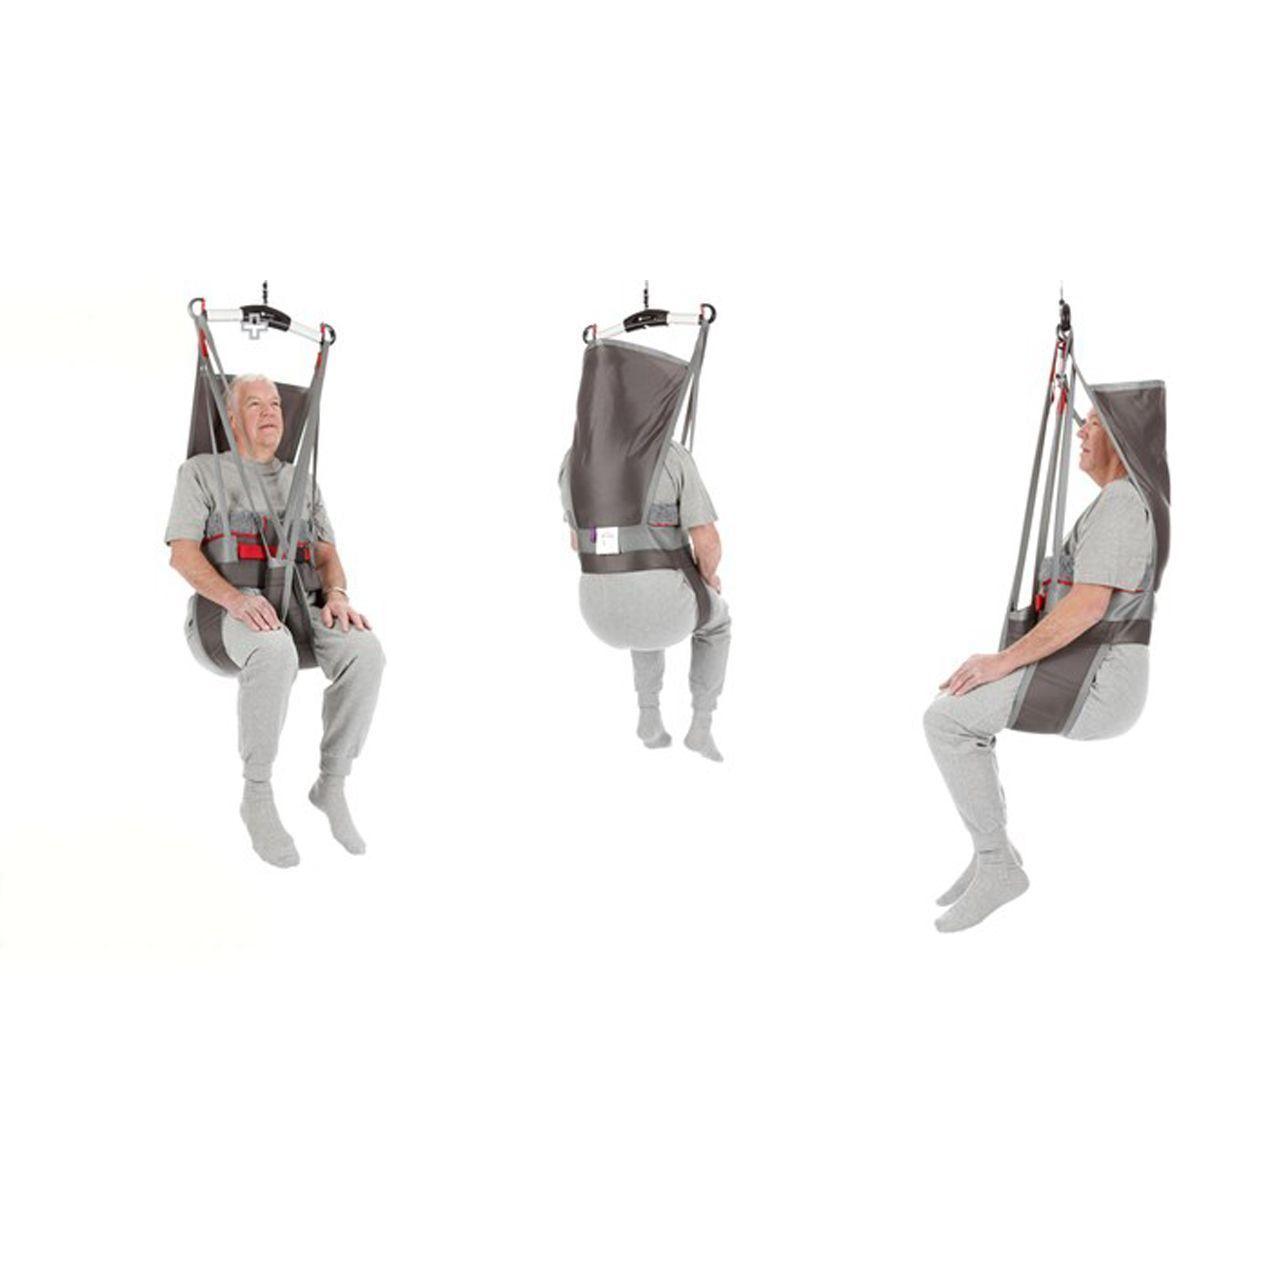 hygiene sling tilbanden tillen totaal